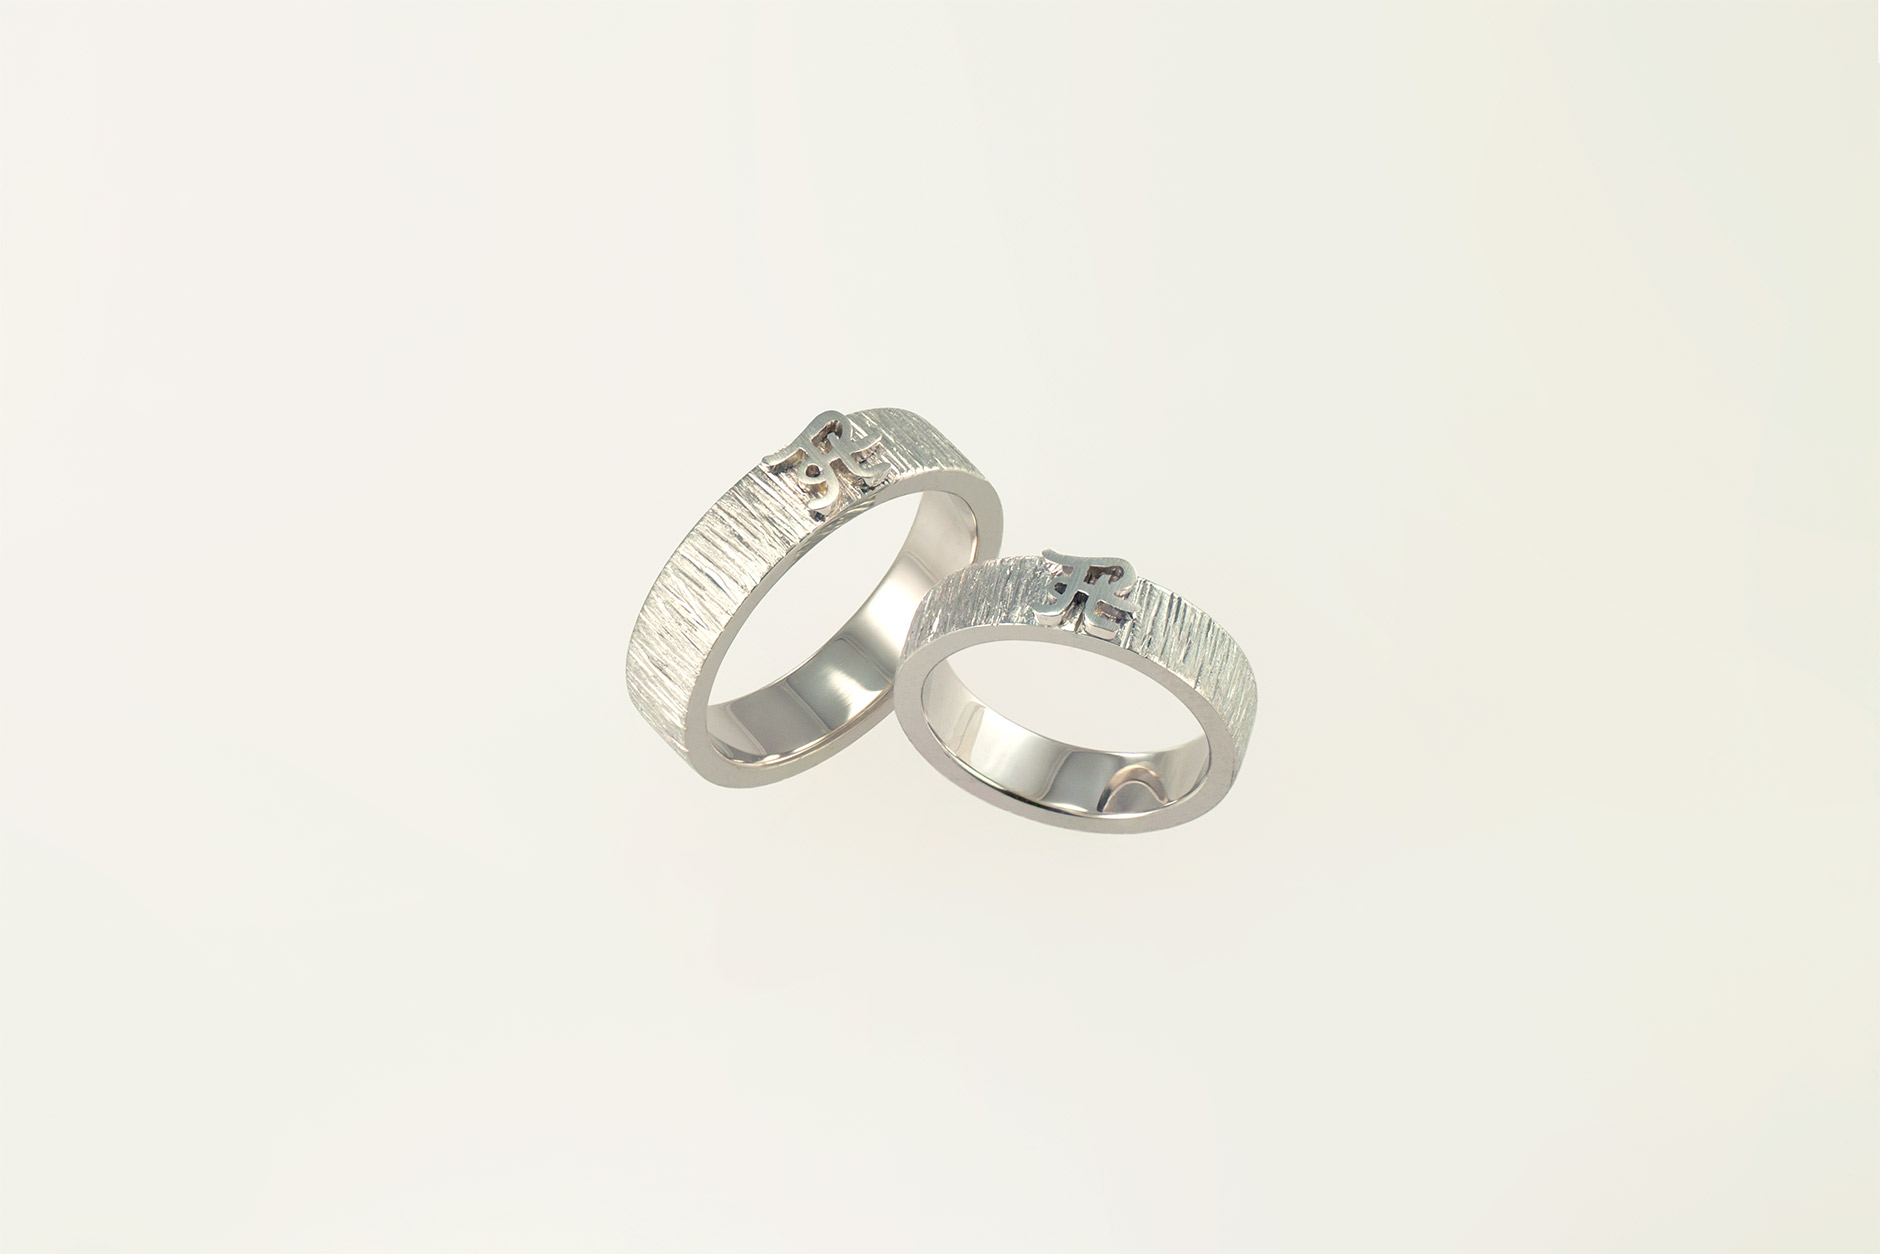 18k White Gold + Platinum Matching Custom Monogram Wedding Rings - NEWA Goldsmith